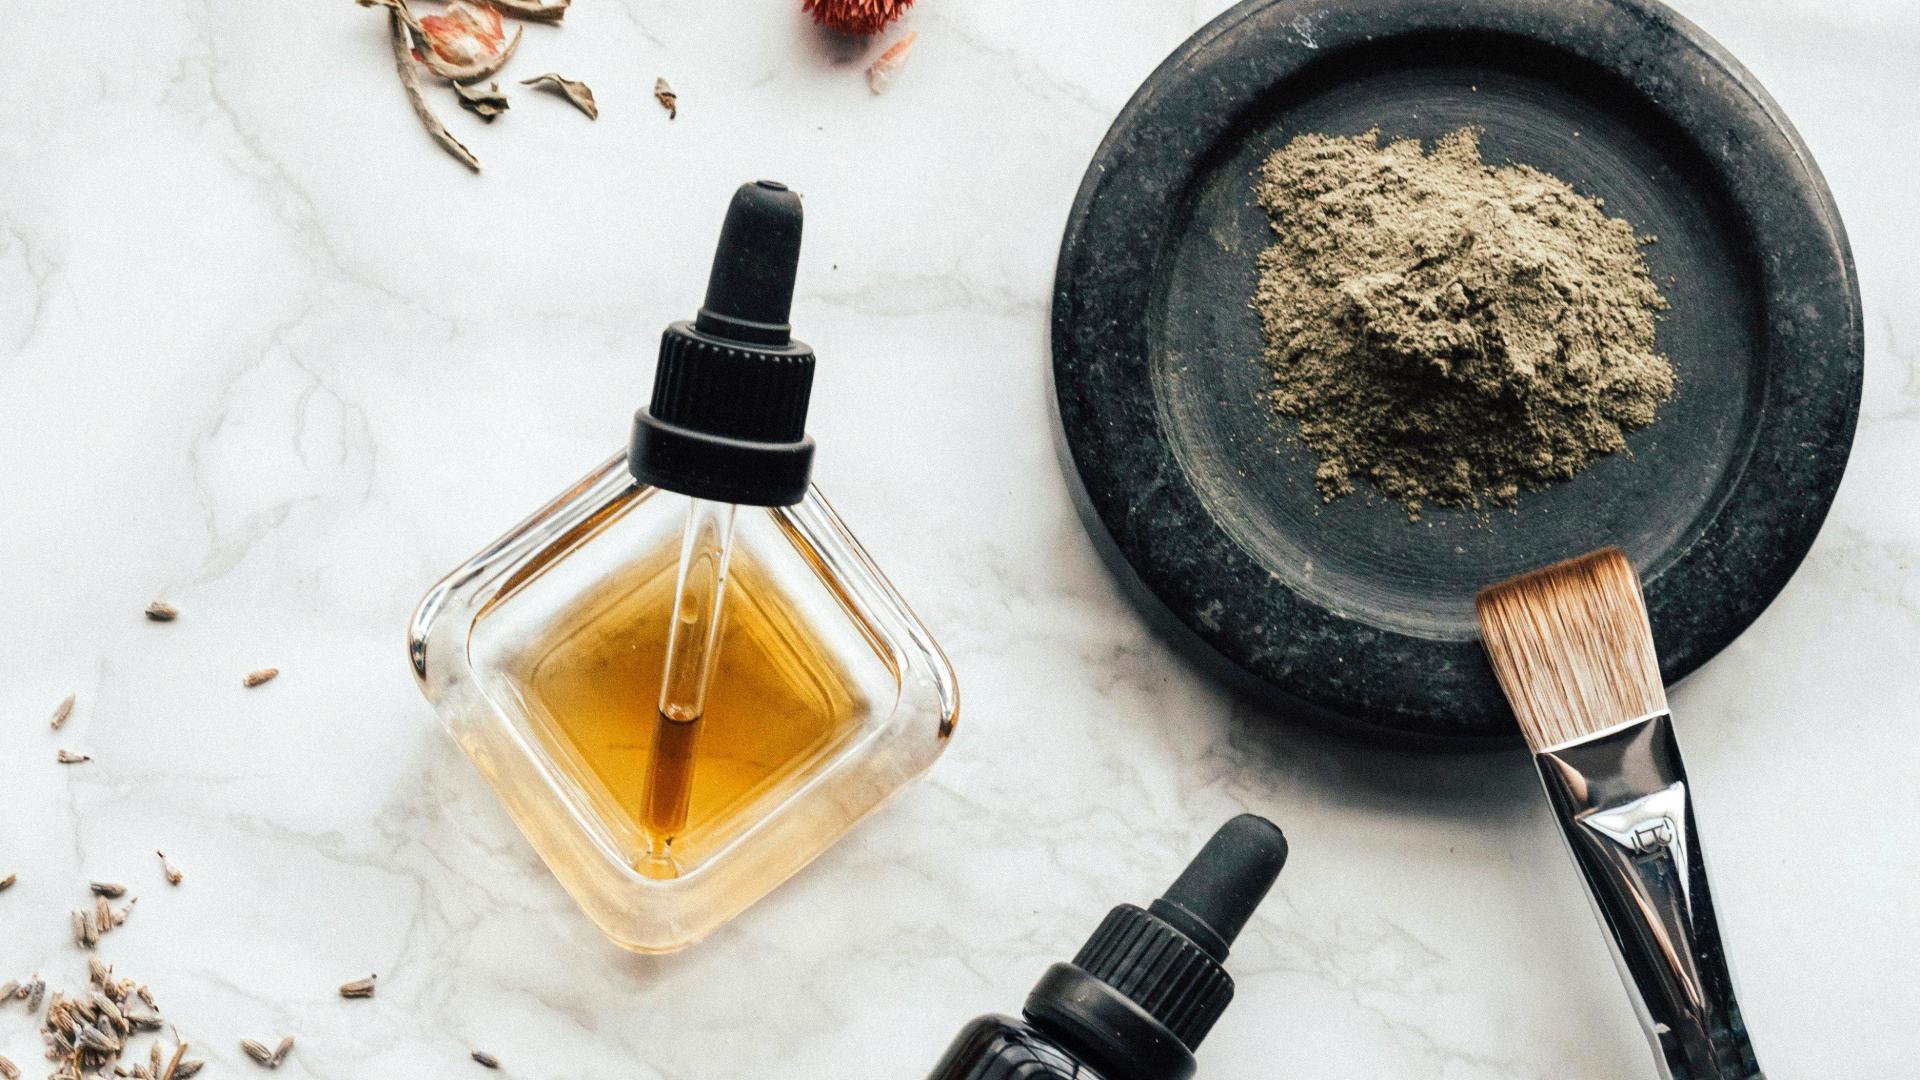 DIY Kosmetik schön arrangiert